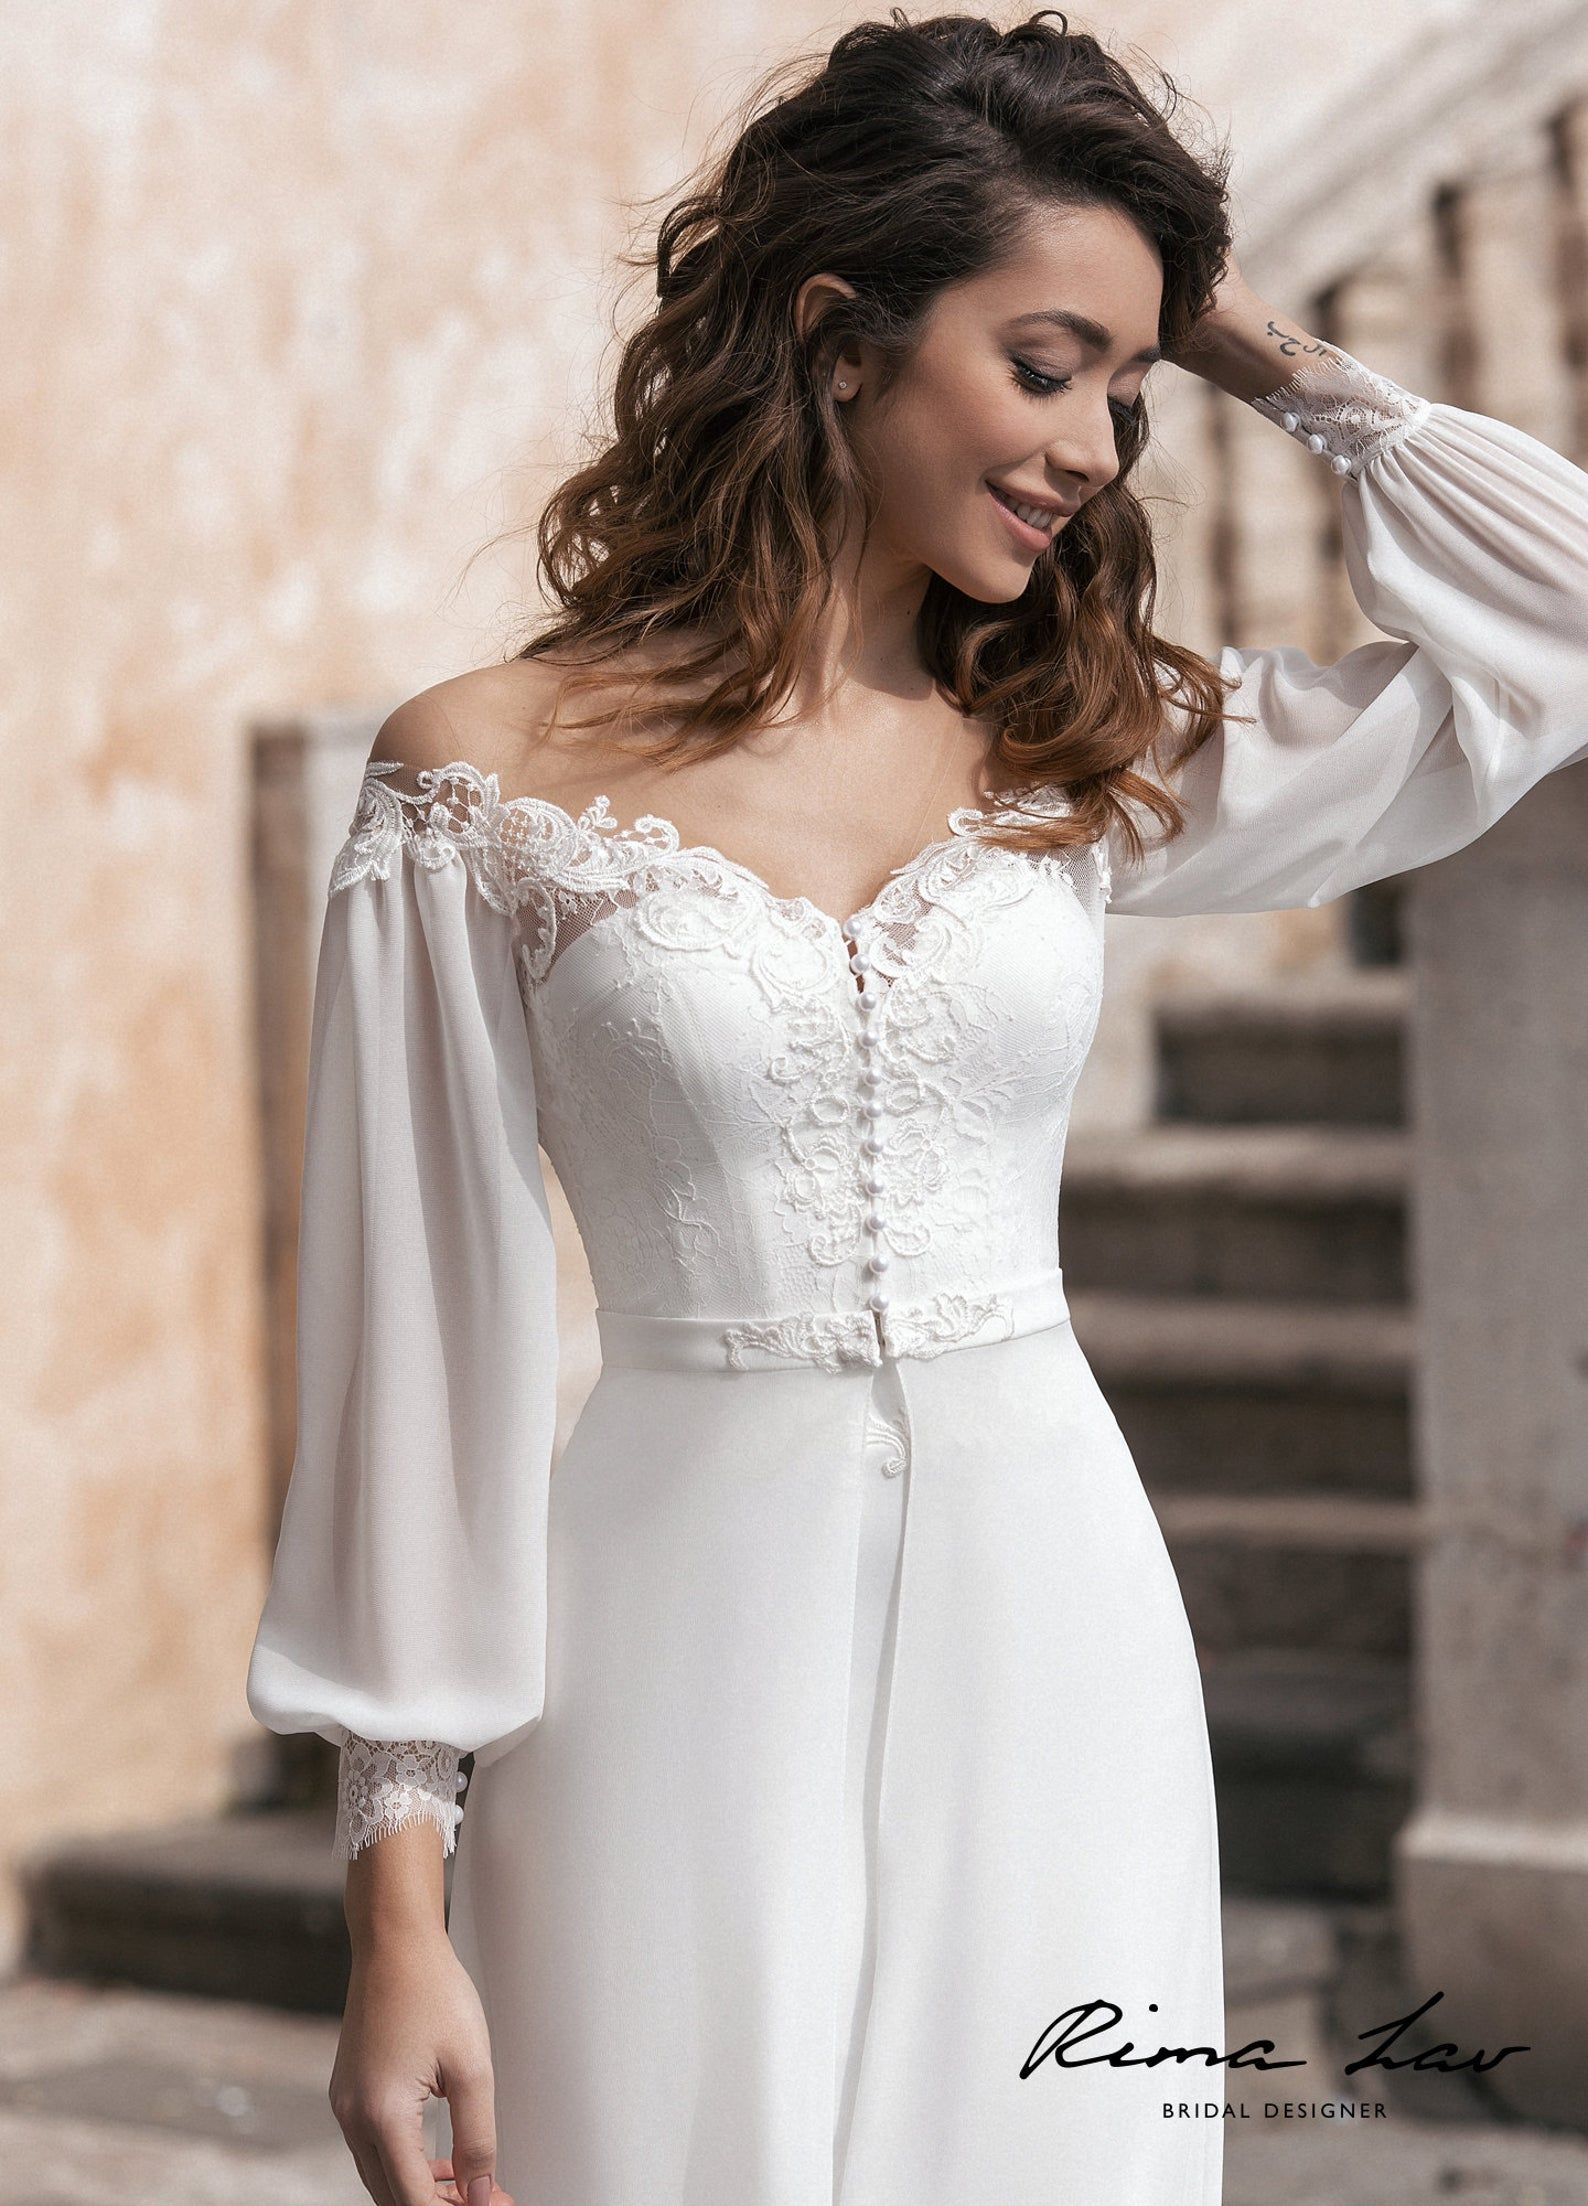 Simple Bustier Lace Minimalist Sheath Sleeveless Wedding Dress Etsy In 2021 Unique Boho Wedding Dress Wedding Dress Long Sleeve Etsy Wedding Dress [ 2206 x 1588 Pixel ]